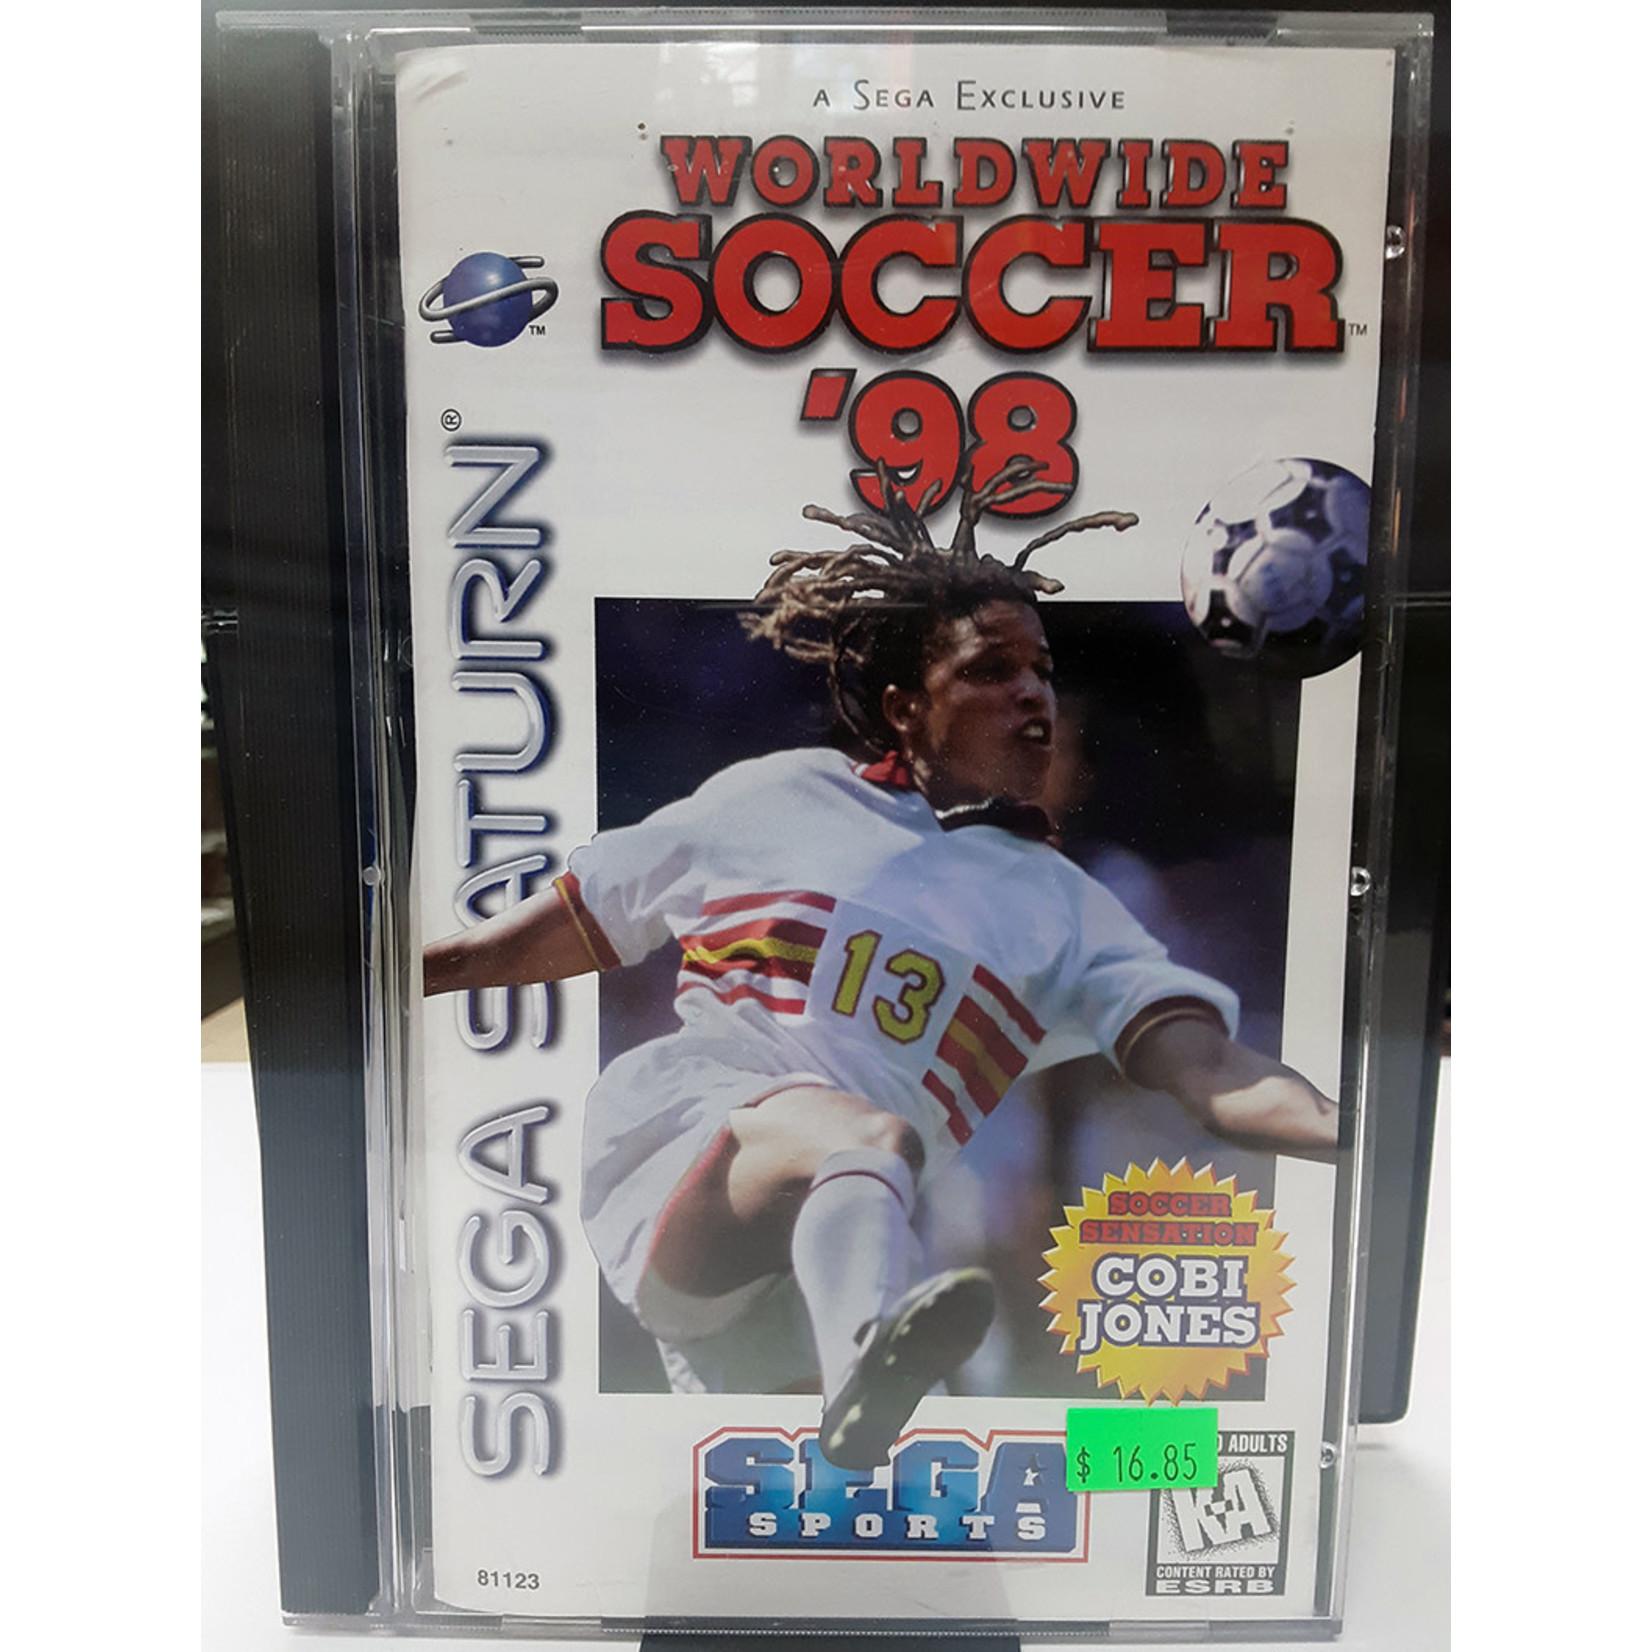 SSU-WORLDWIDE SOCCER 98